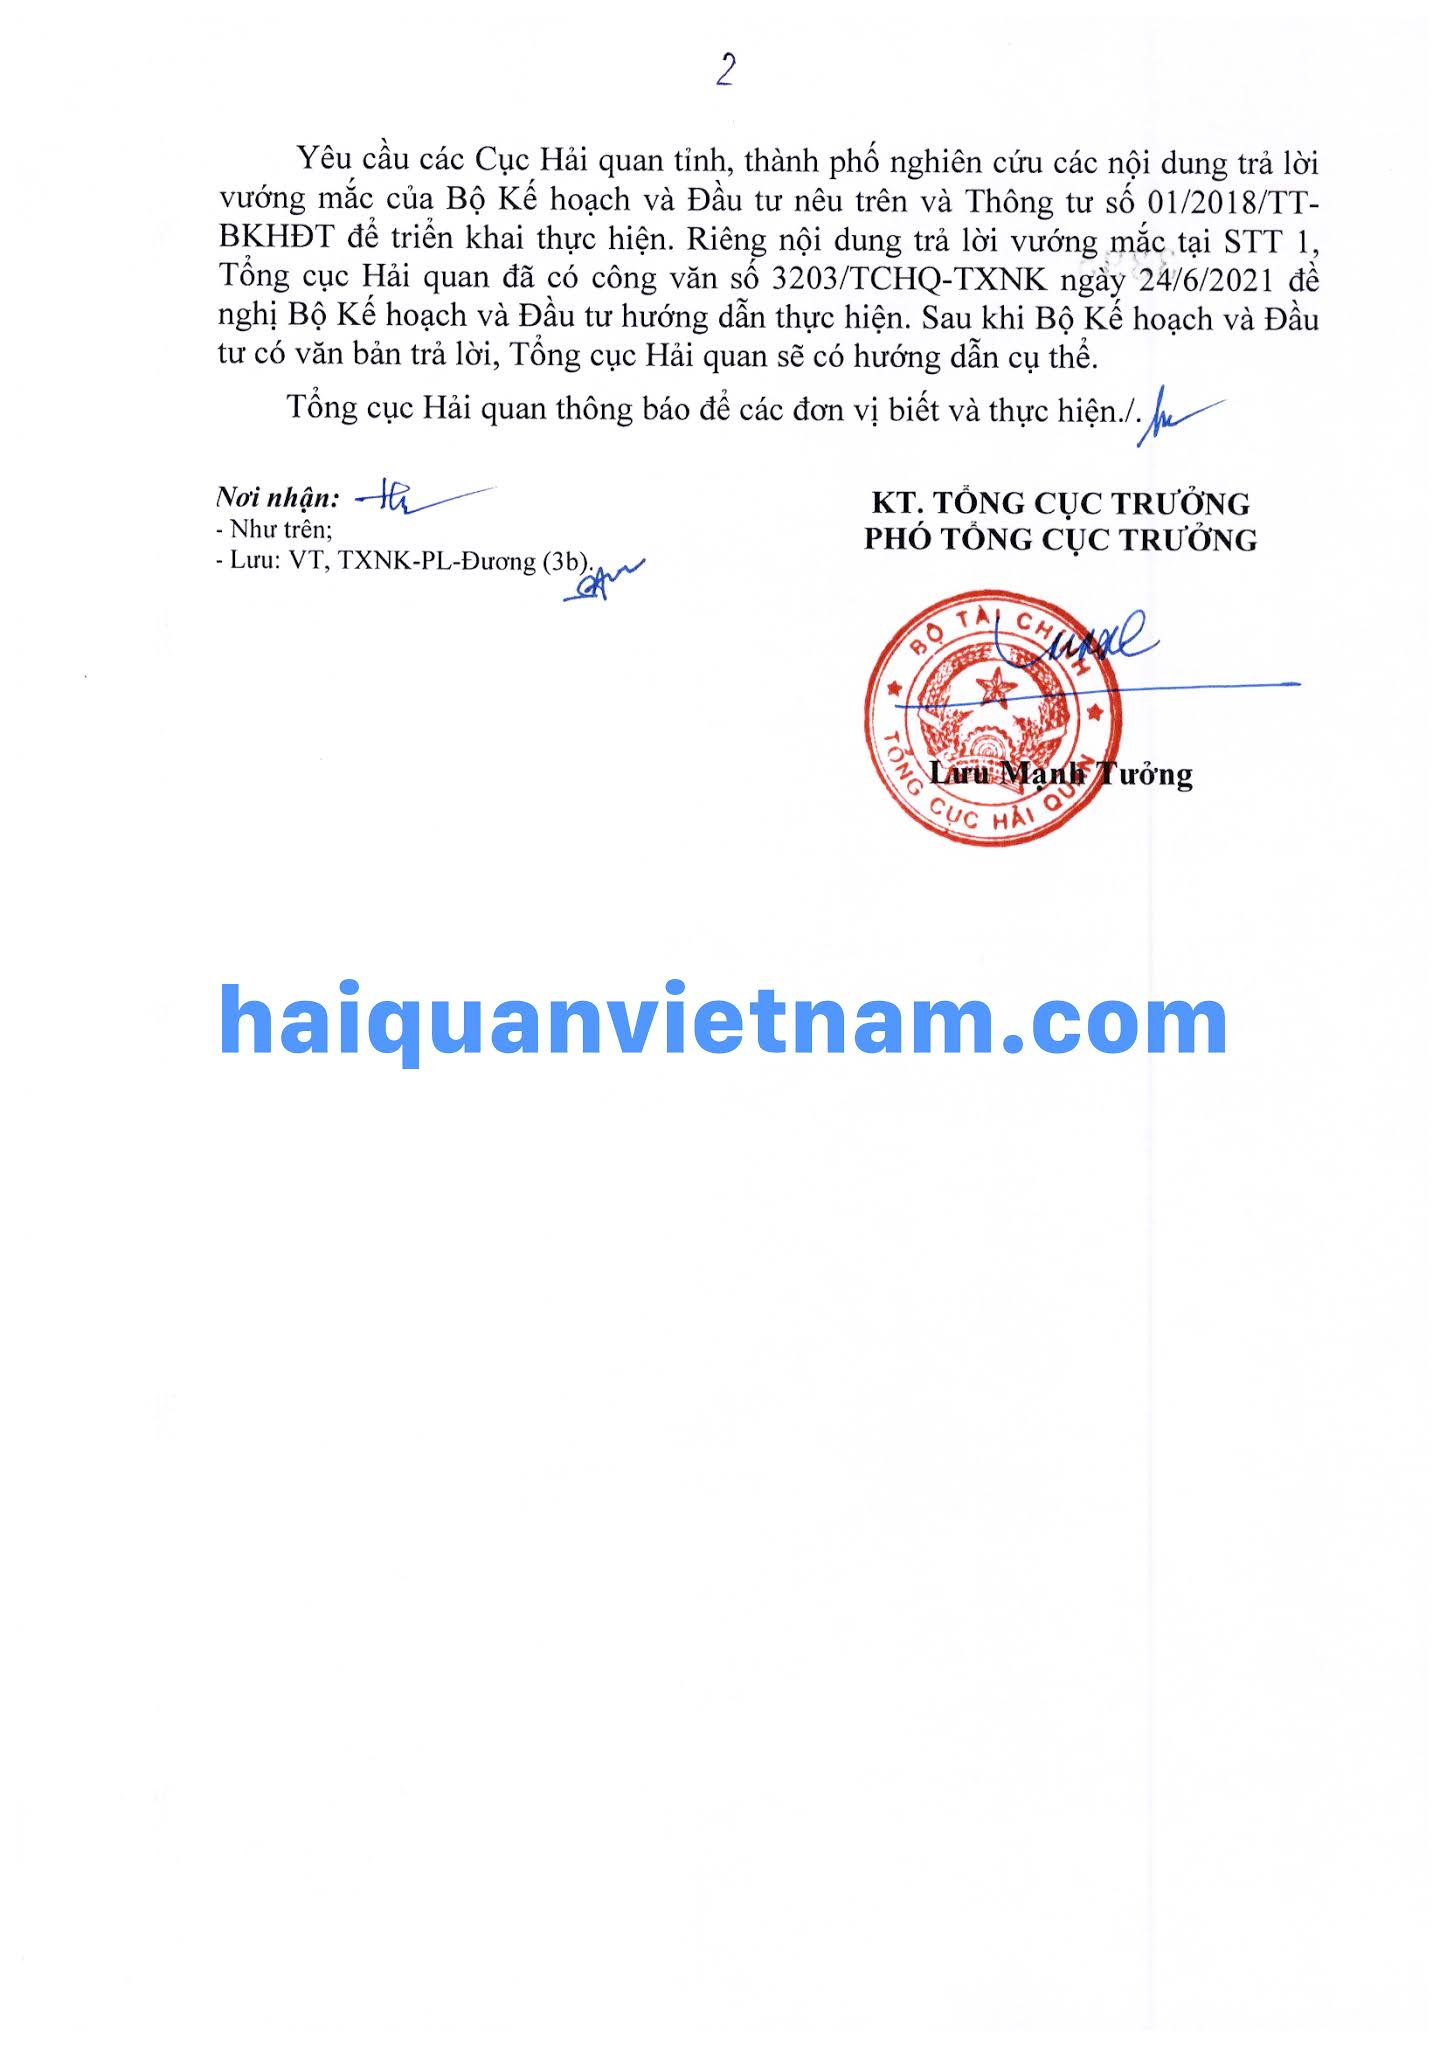 [Image: 210706-3395-TCHQ-TXNK_haiquanvietnam_02.jpg]